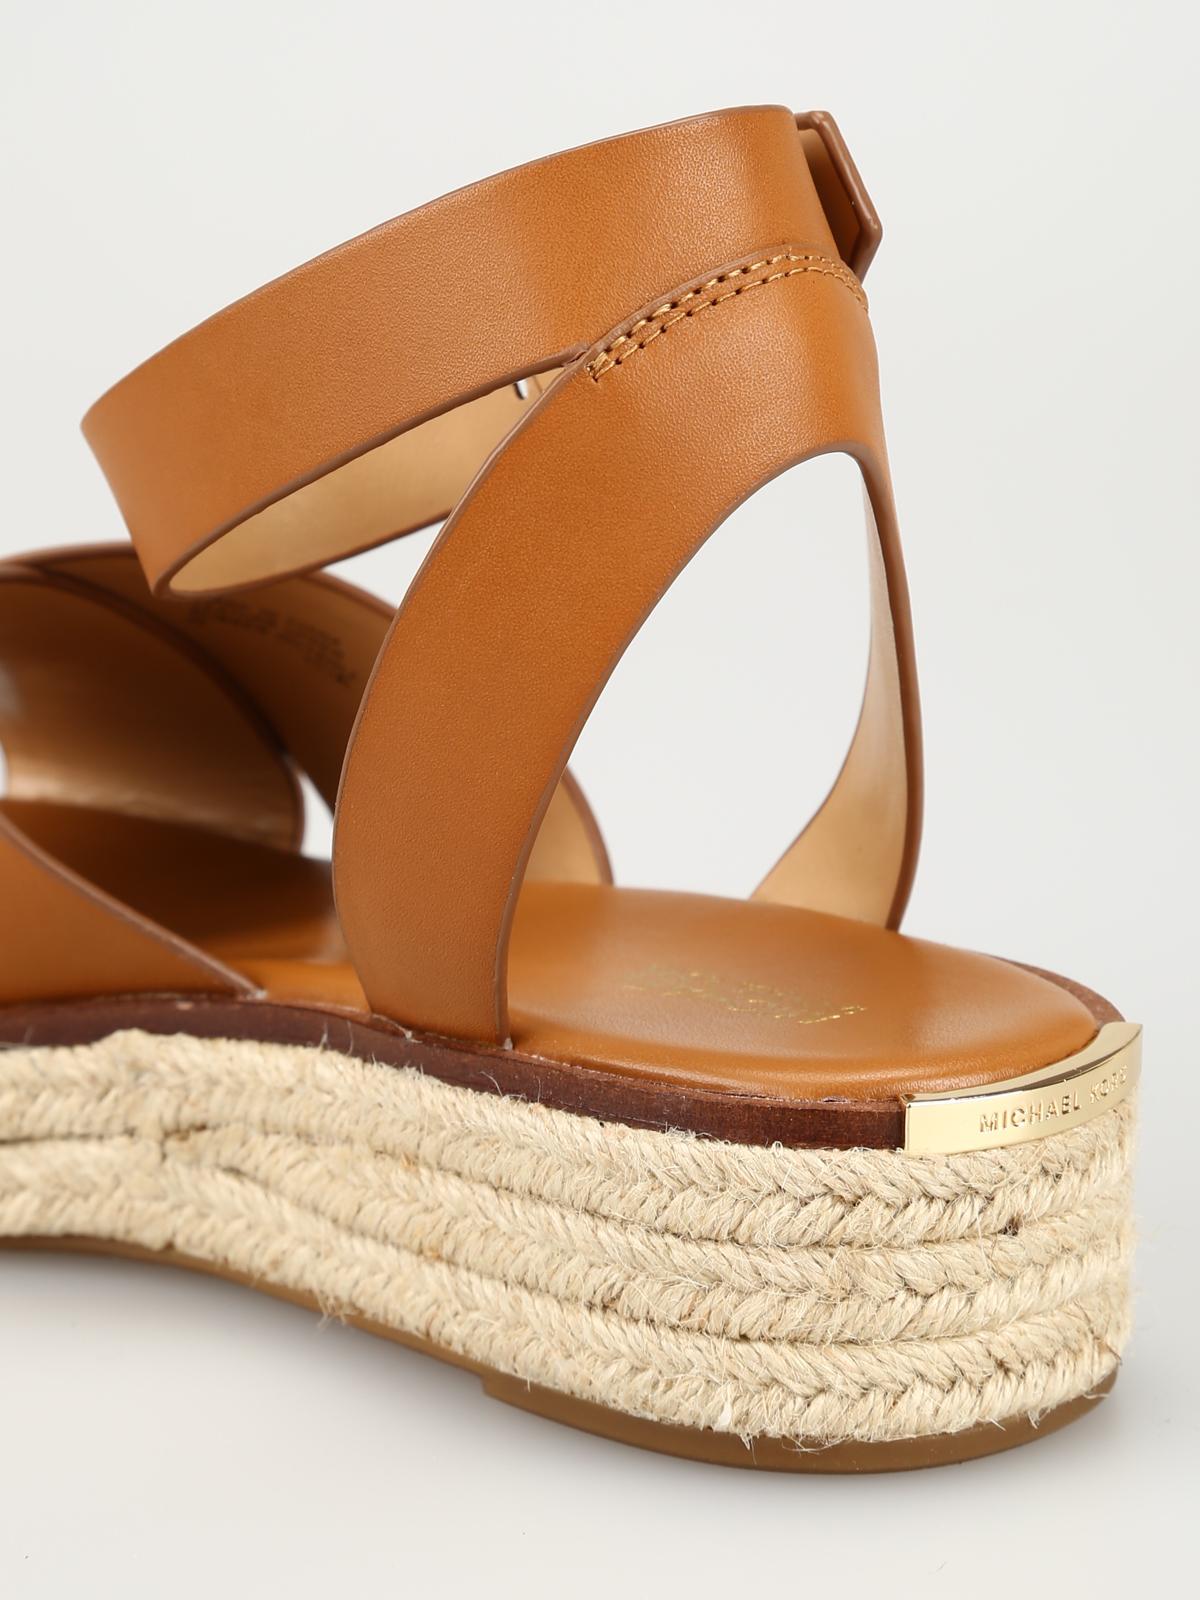 Michael Kors - Abbott sandals - sandals